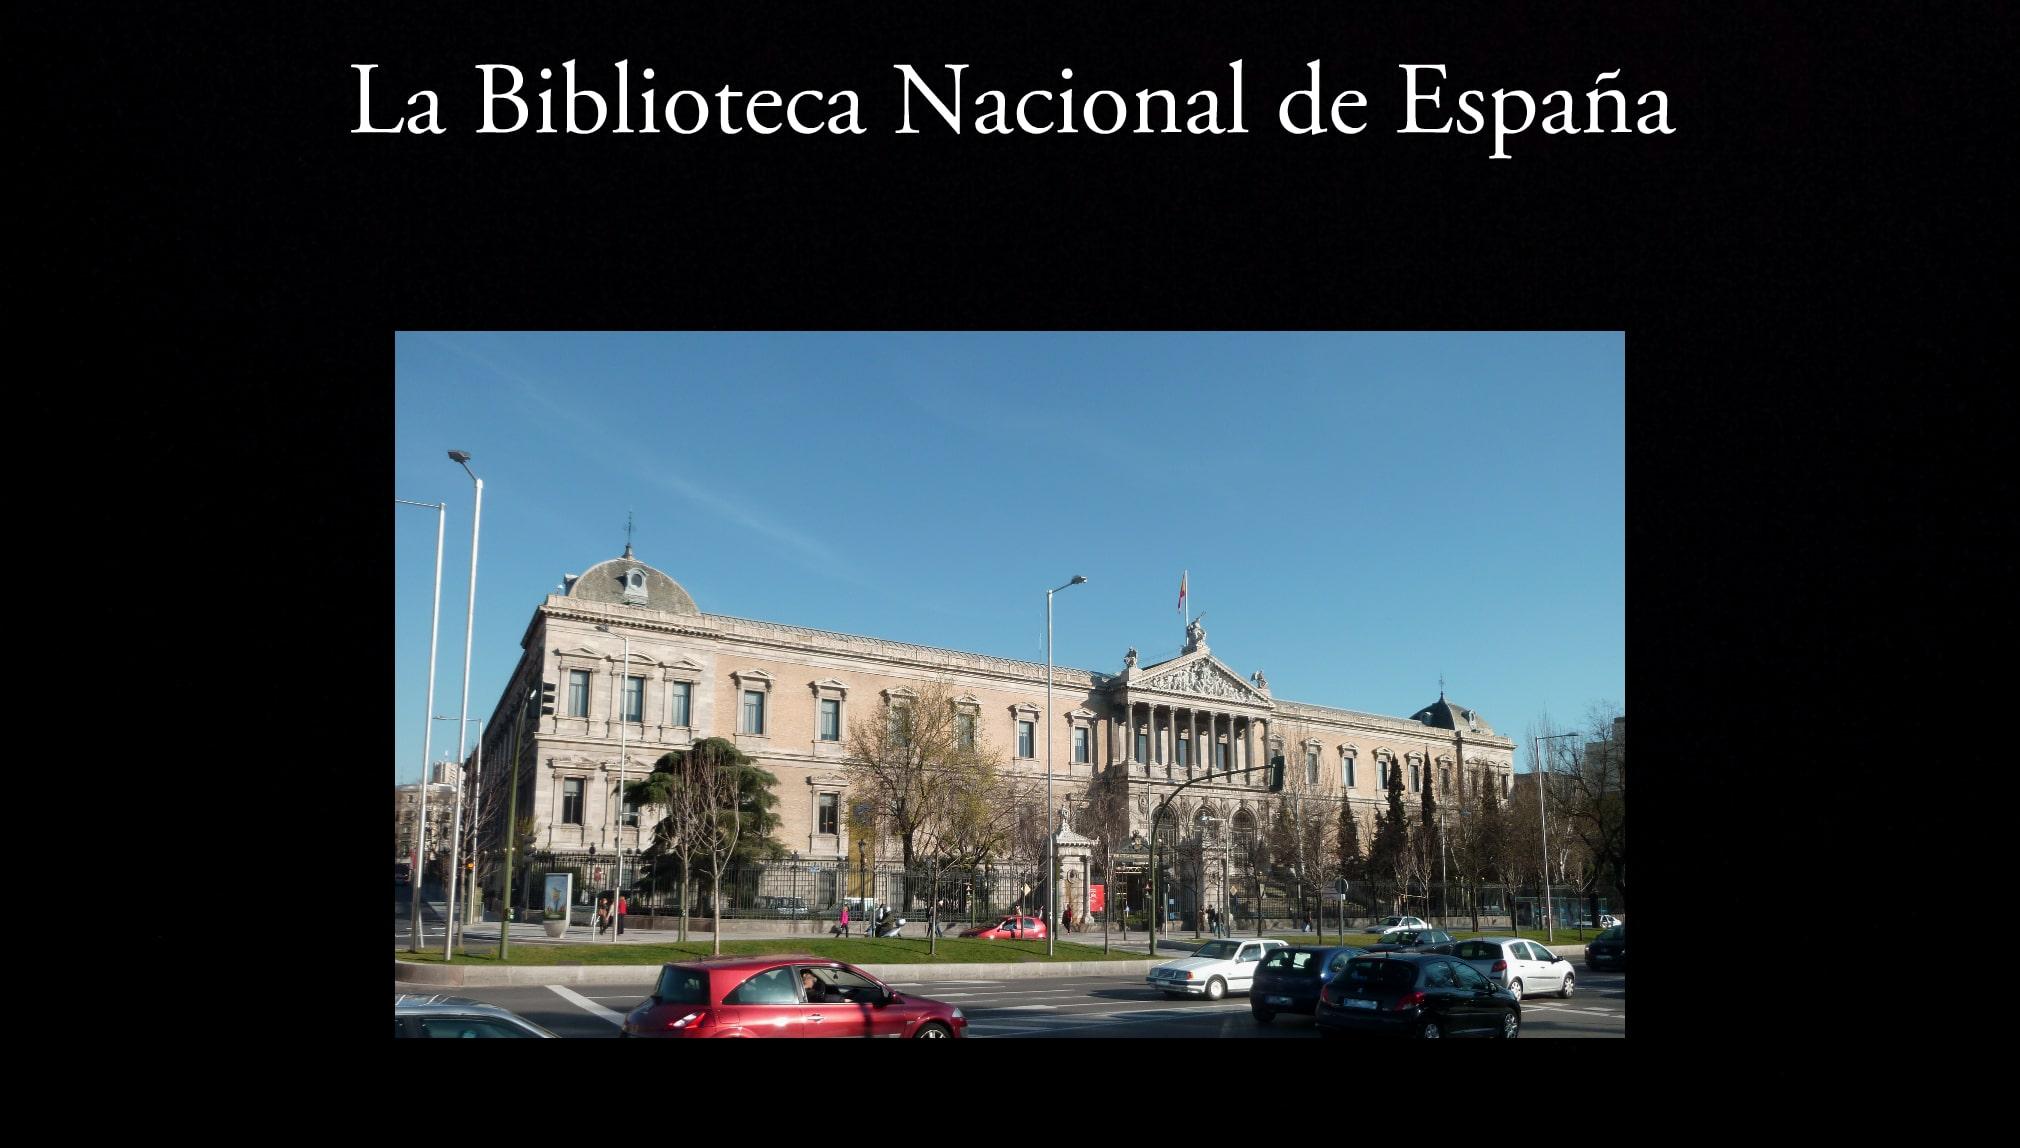 La Biblioteca Nacional de España.